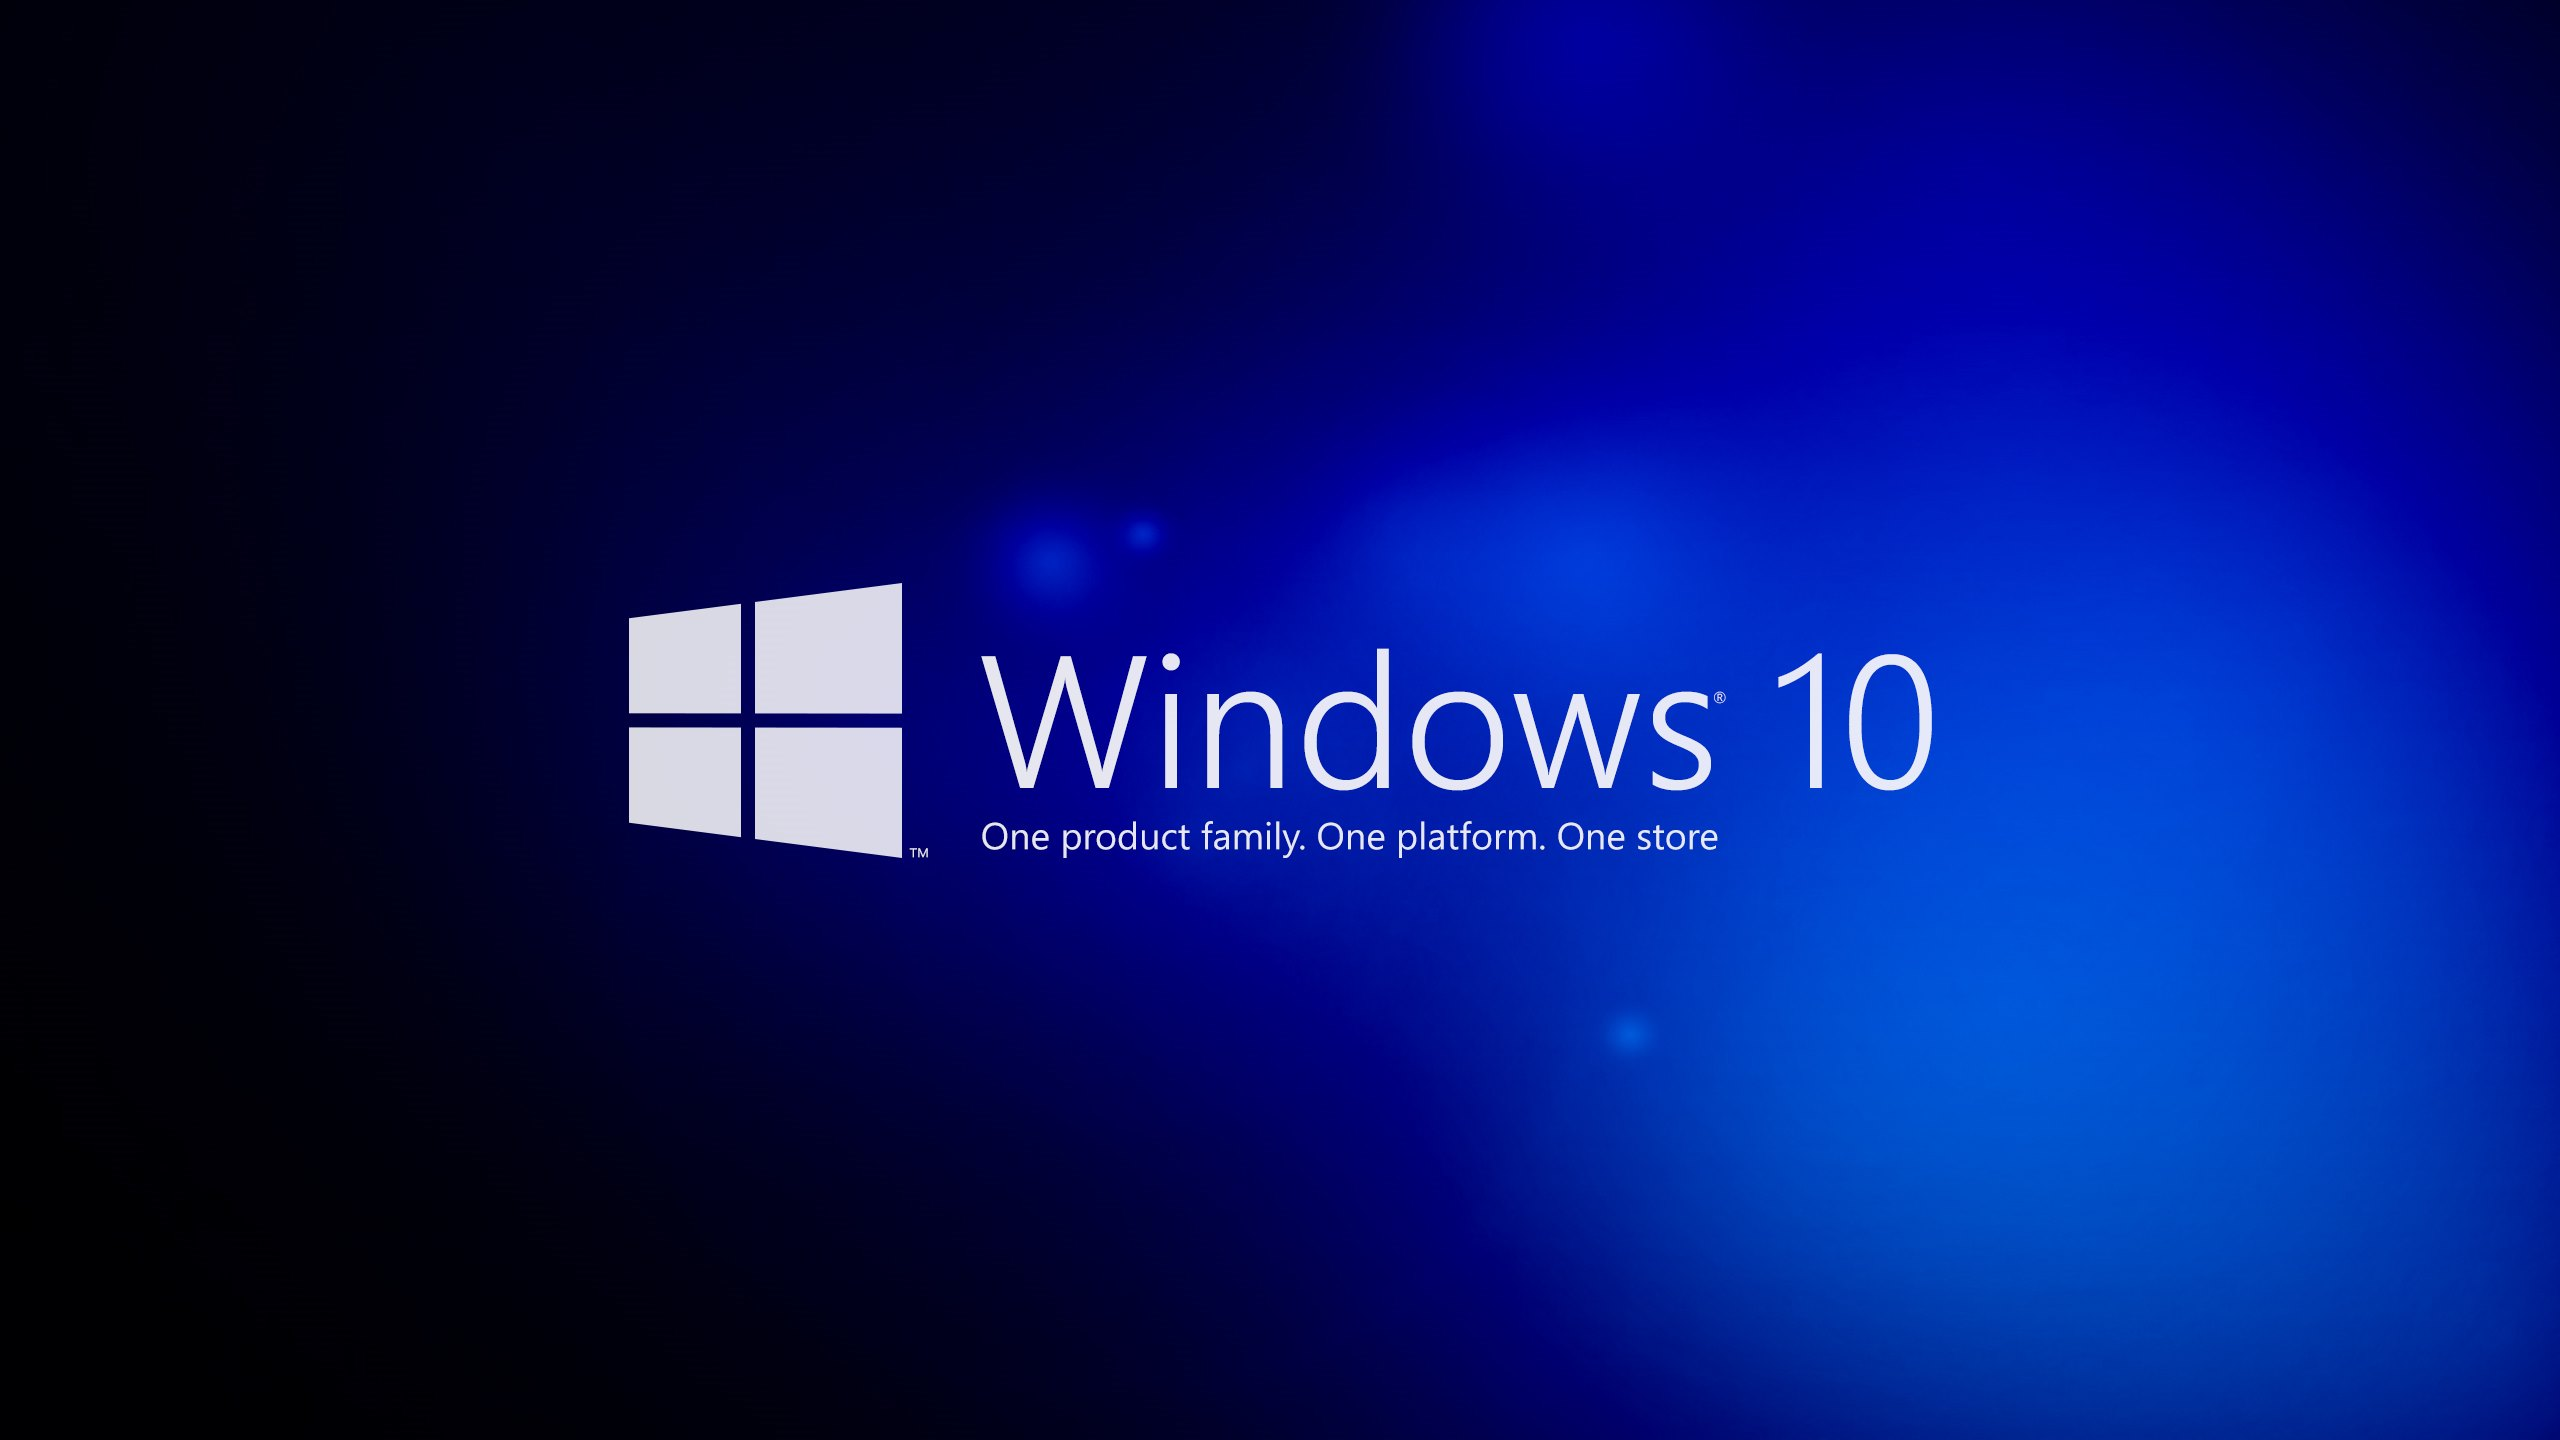 Windows 10 HD Wallpapers 4K Wallpapers 2560x1440